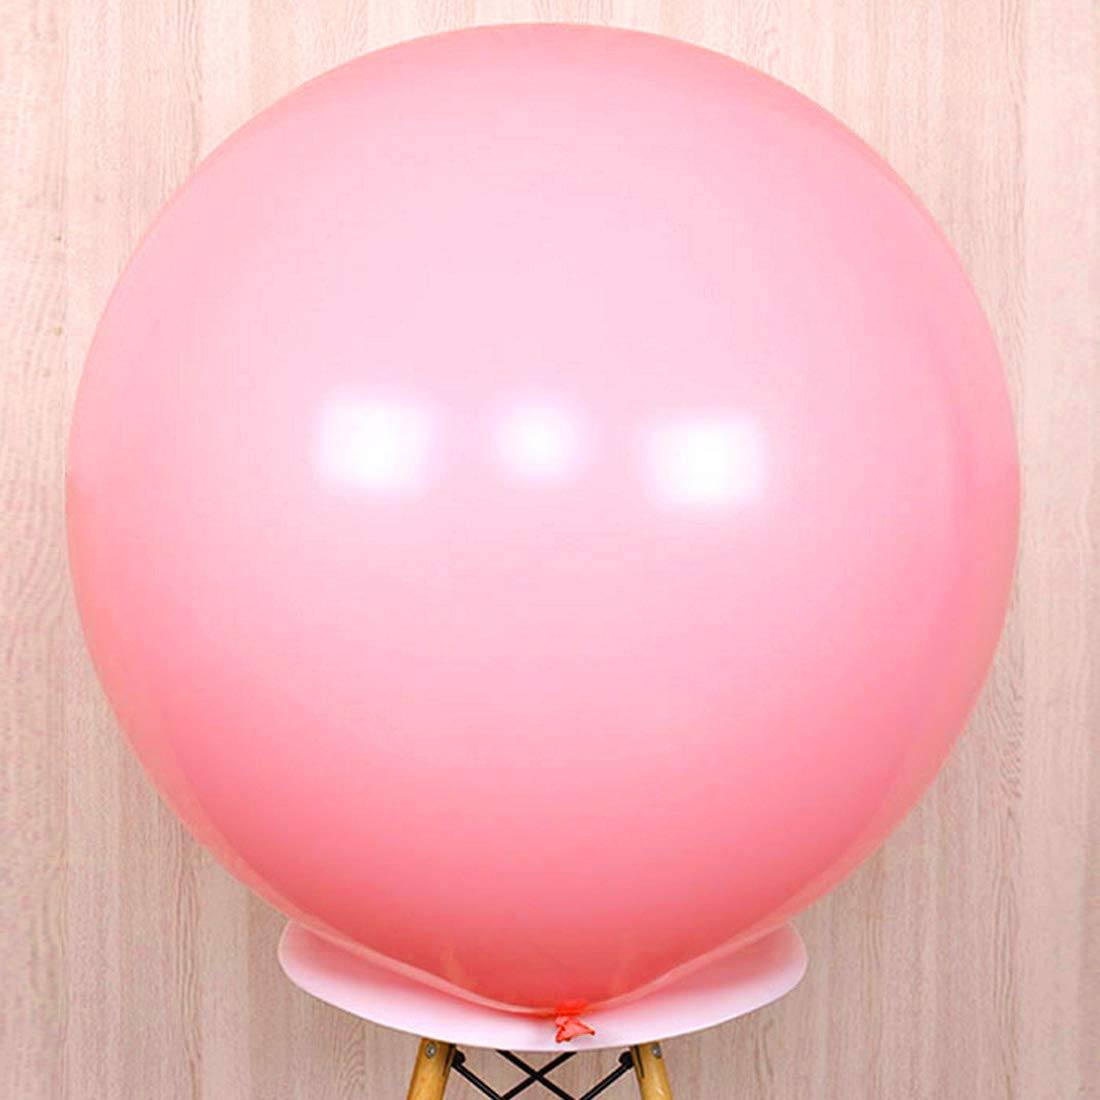 GuassLee Lバルーン 6個入り 36 INCH ホワイト 6 Tai Pink   B07PMYYHL4